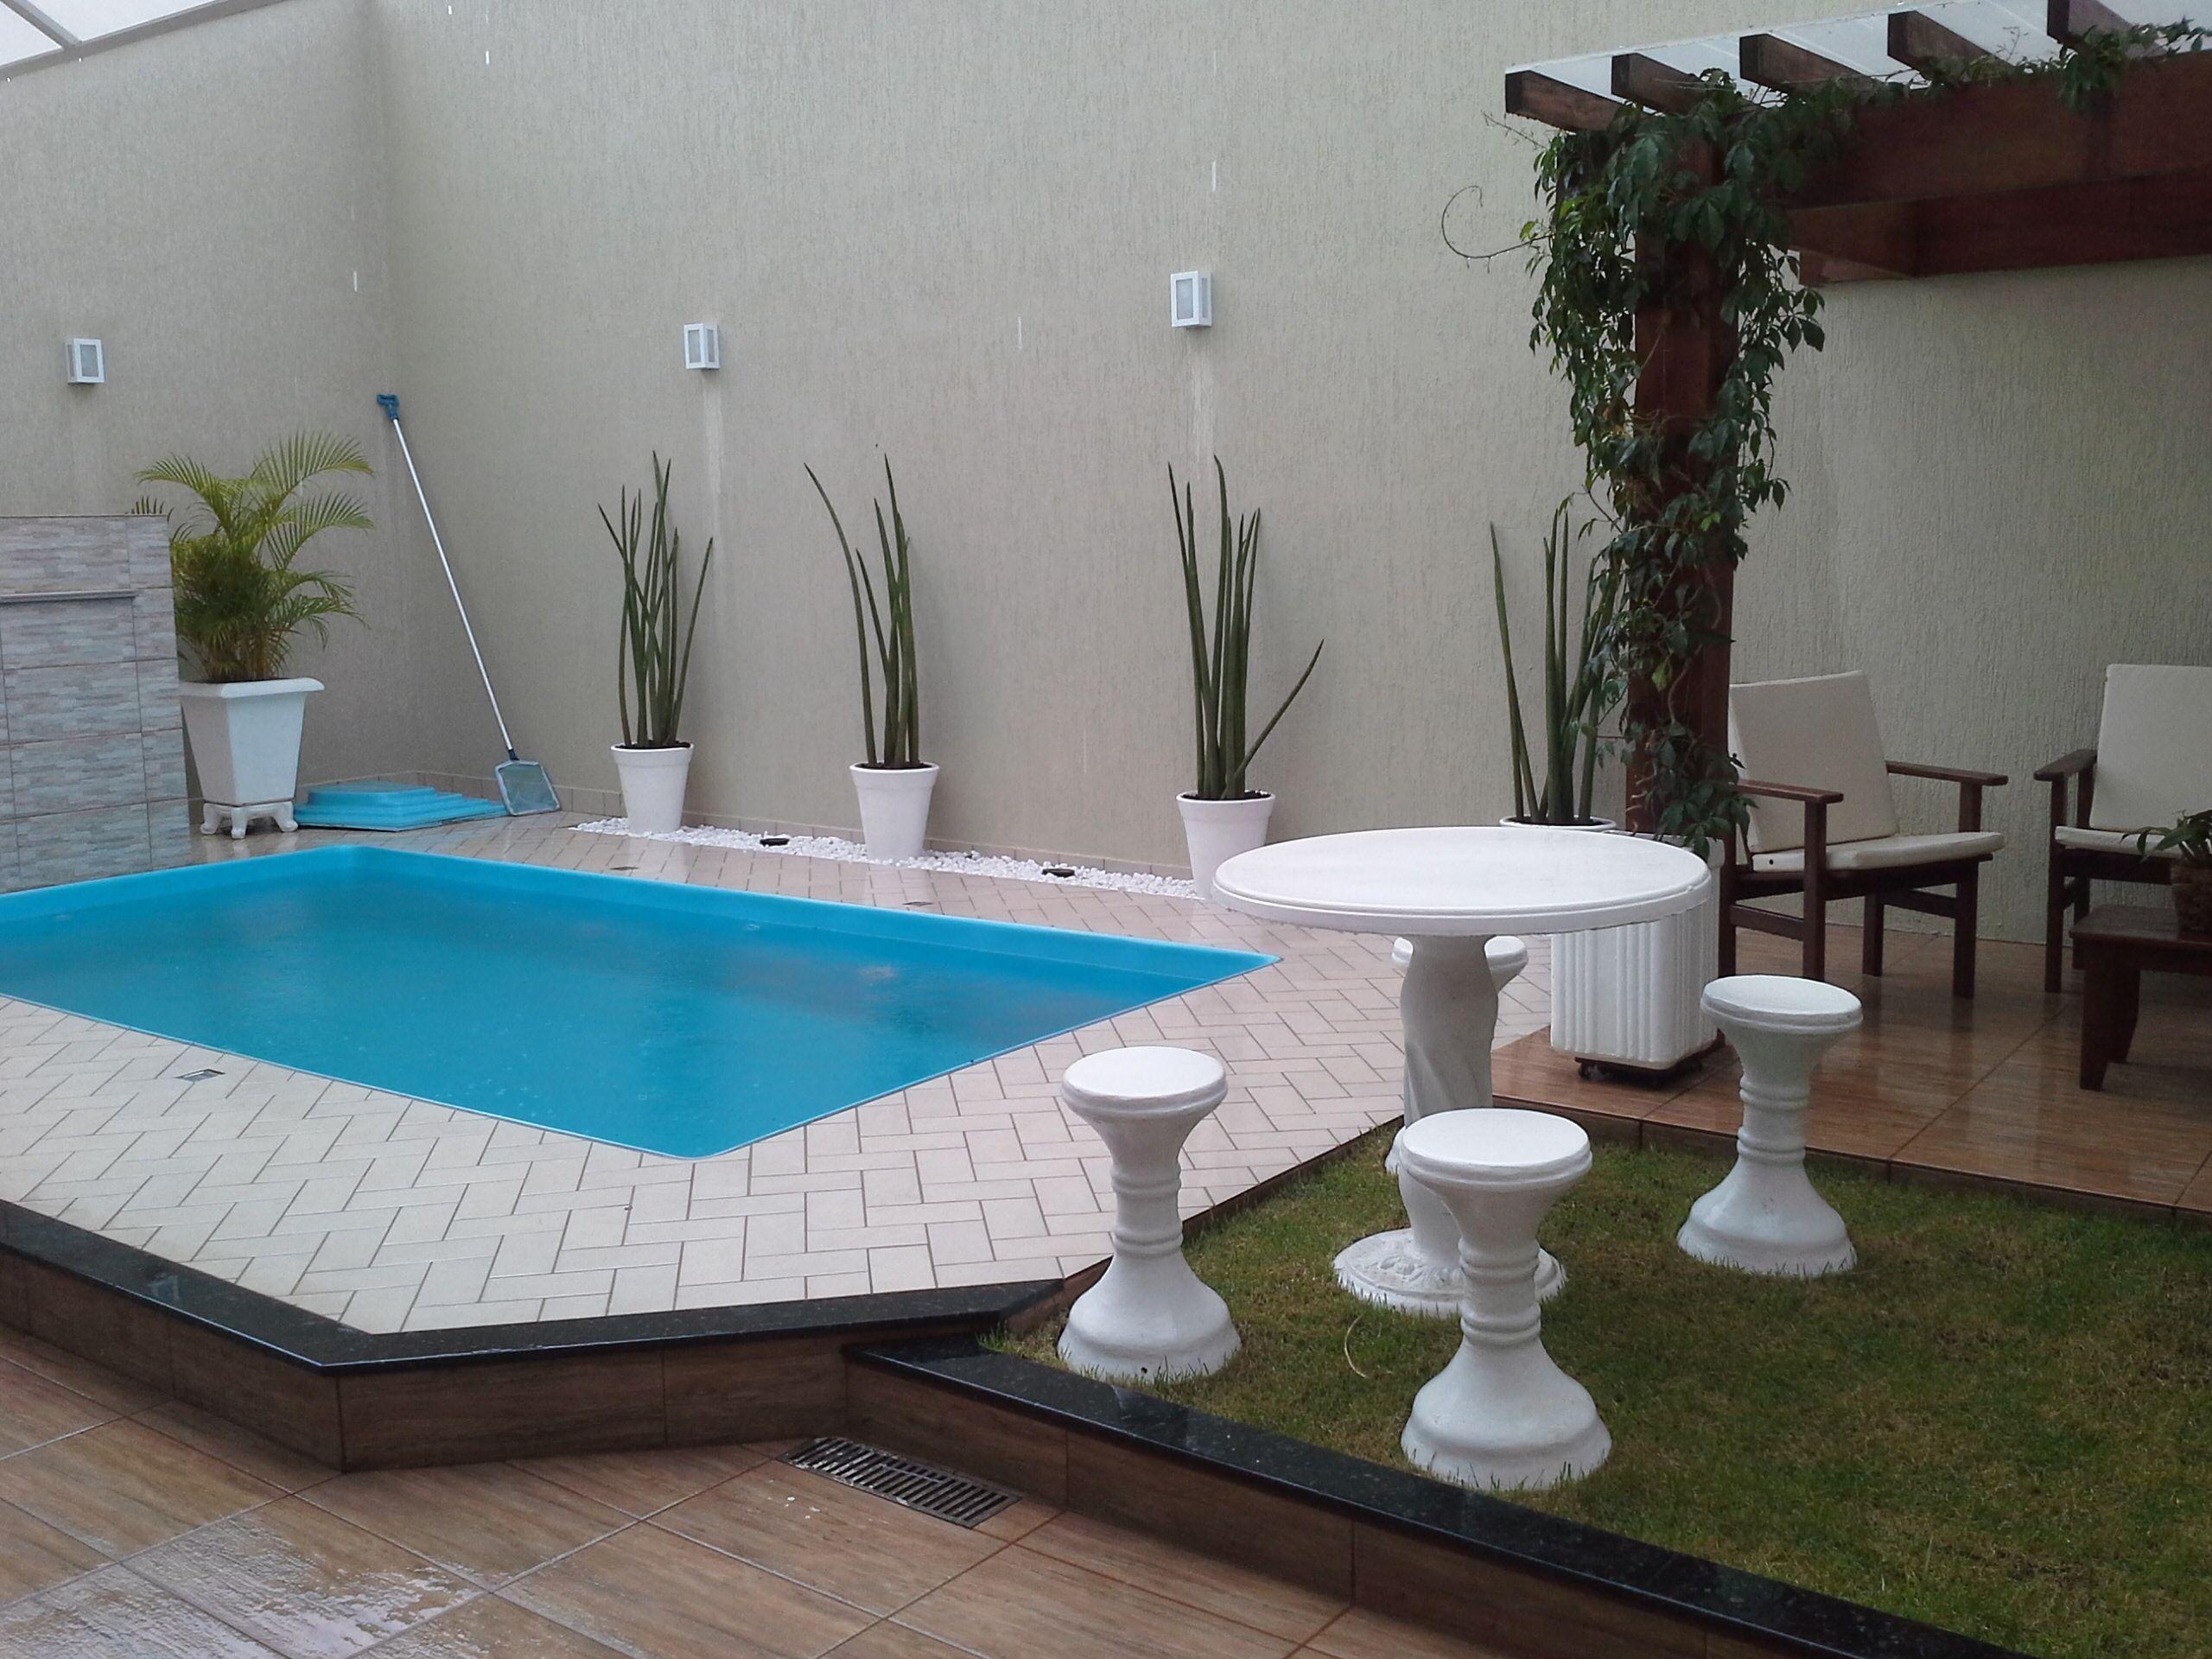 Piscina de fibra decoraci n pinterest piscinas for Pileta jardin pequeno